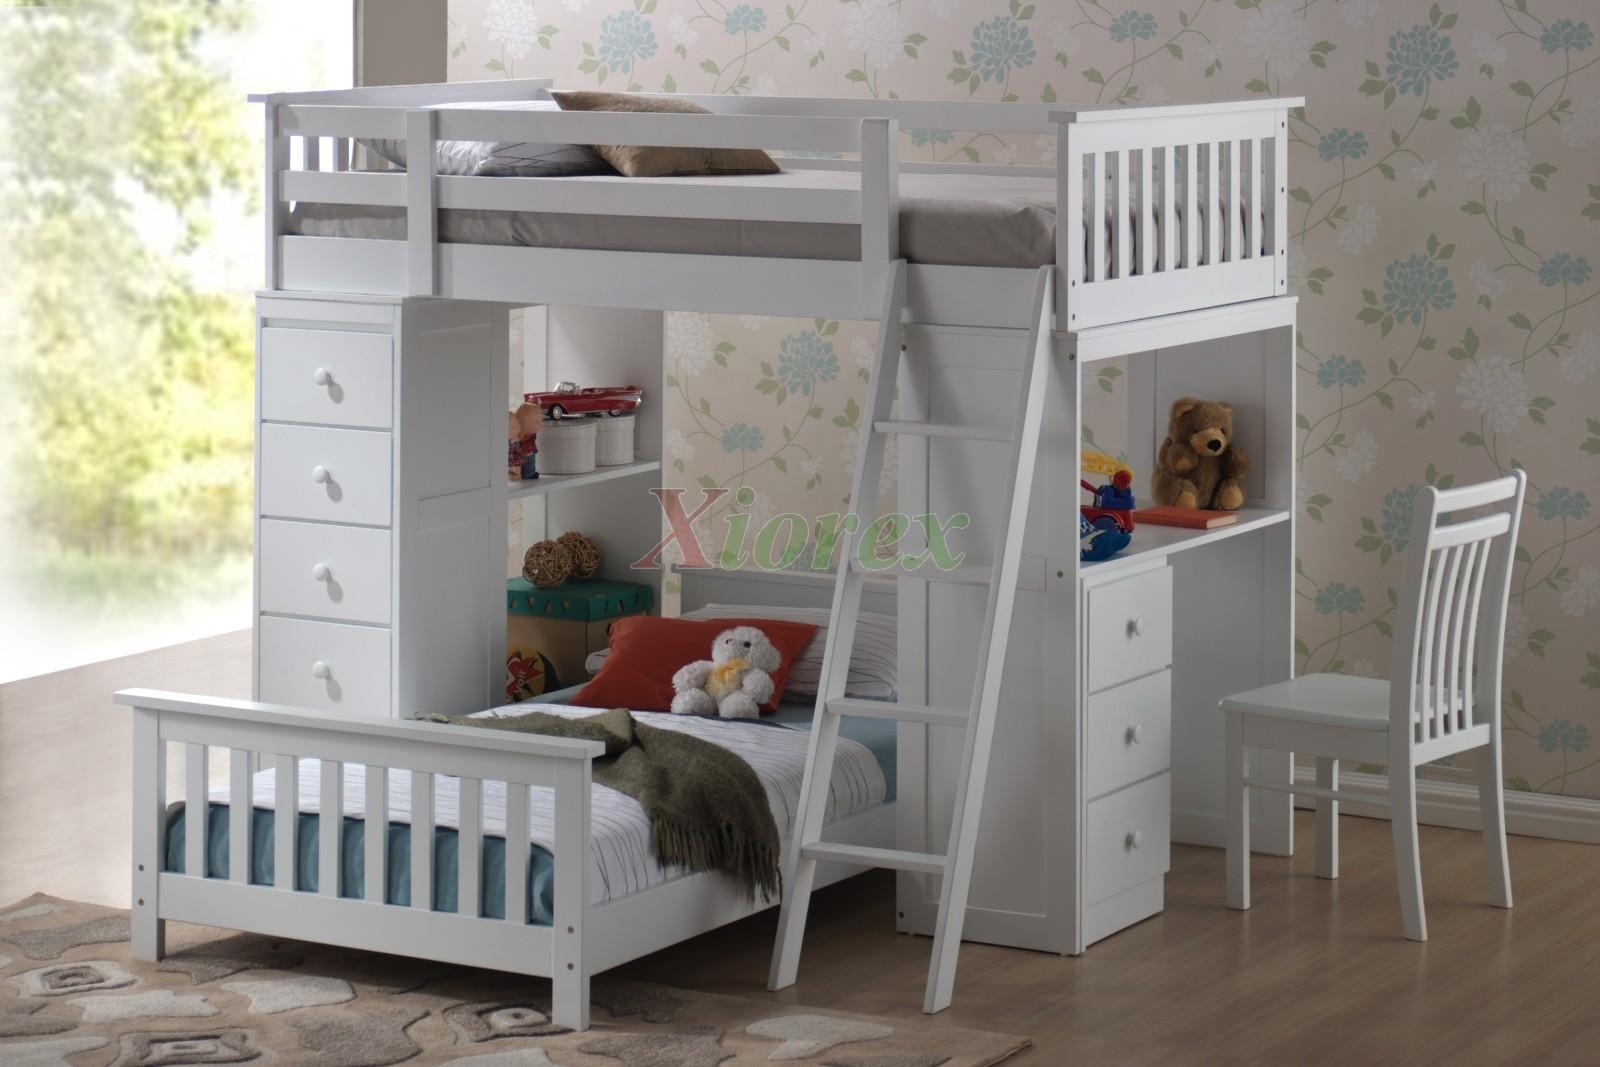 Huckleberry Loft Bunk Beds For Kids With Storage Desk